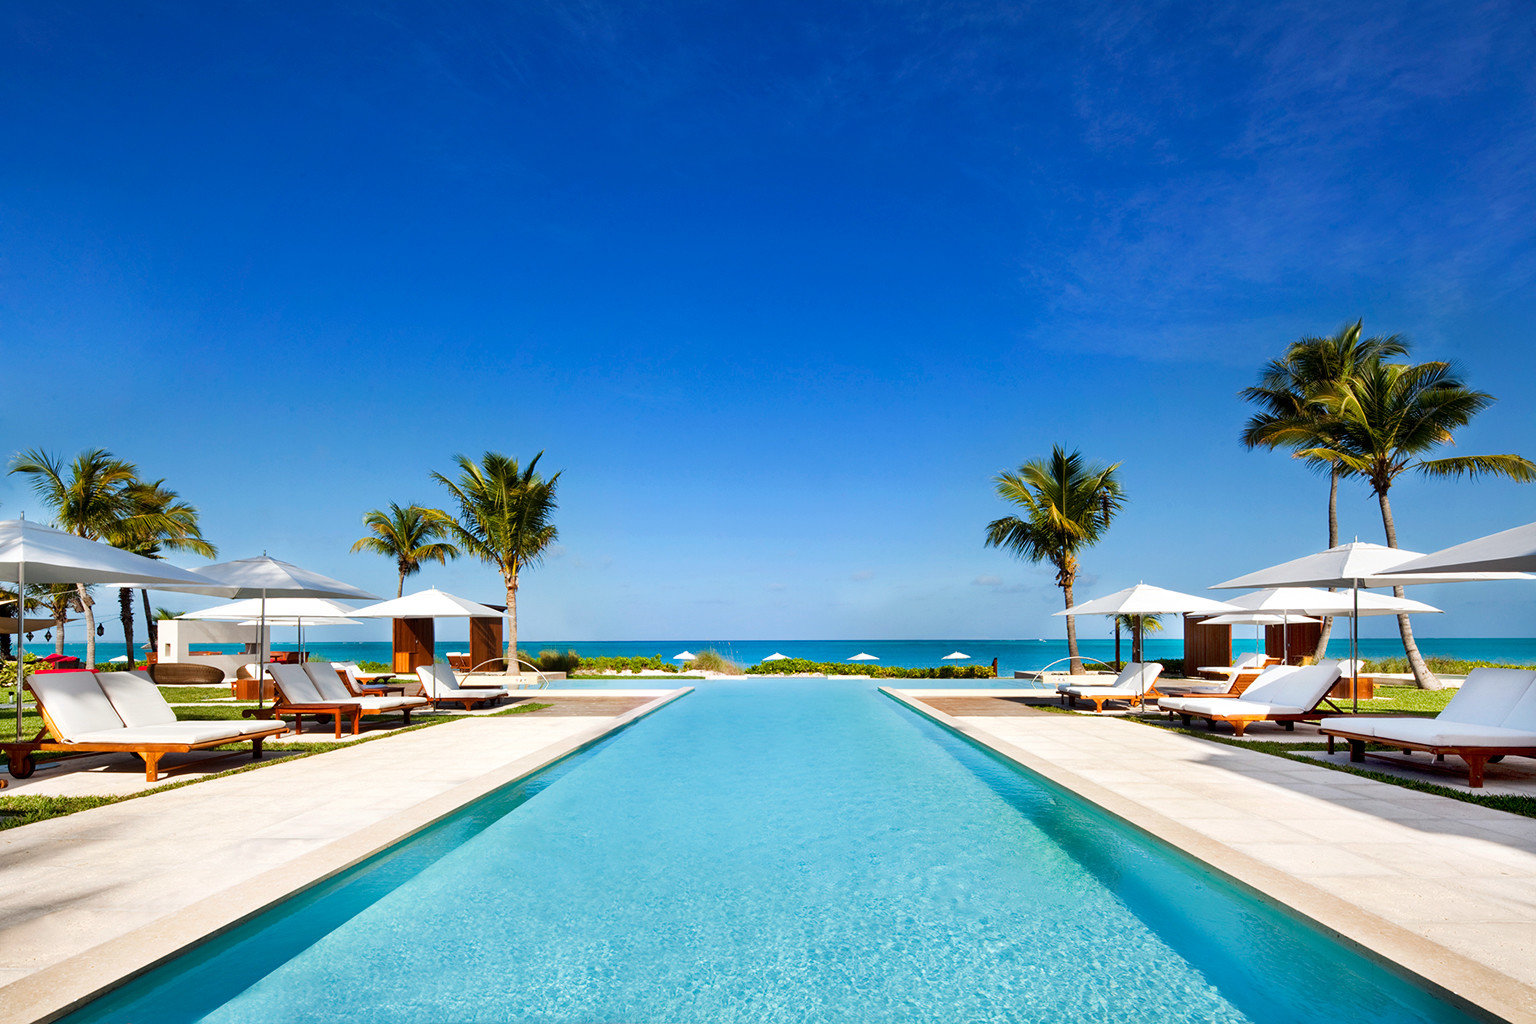 Beachfront Grounds Hotels Luxury Pool sky leisure swimming pool Beach Resort Sea caribbean Ocean way marina Coast Lagoon dock colorful lined highway